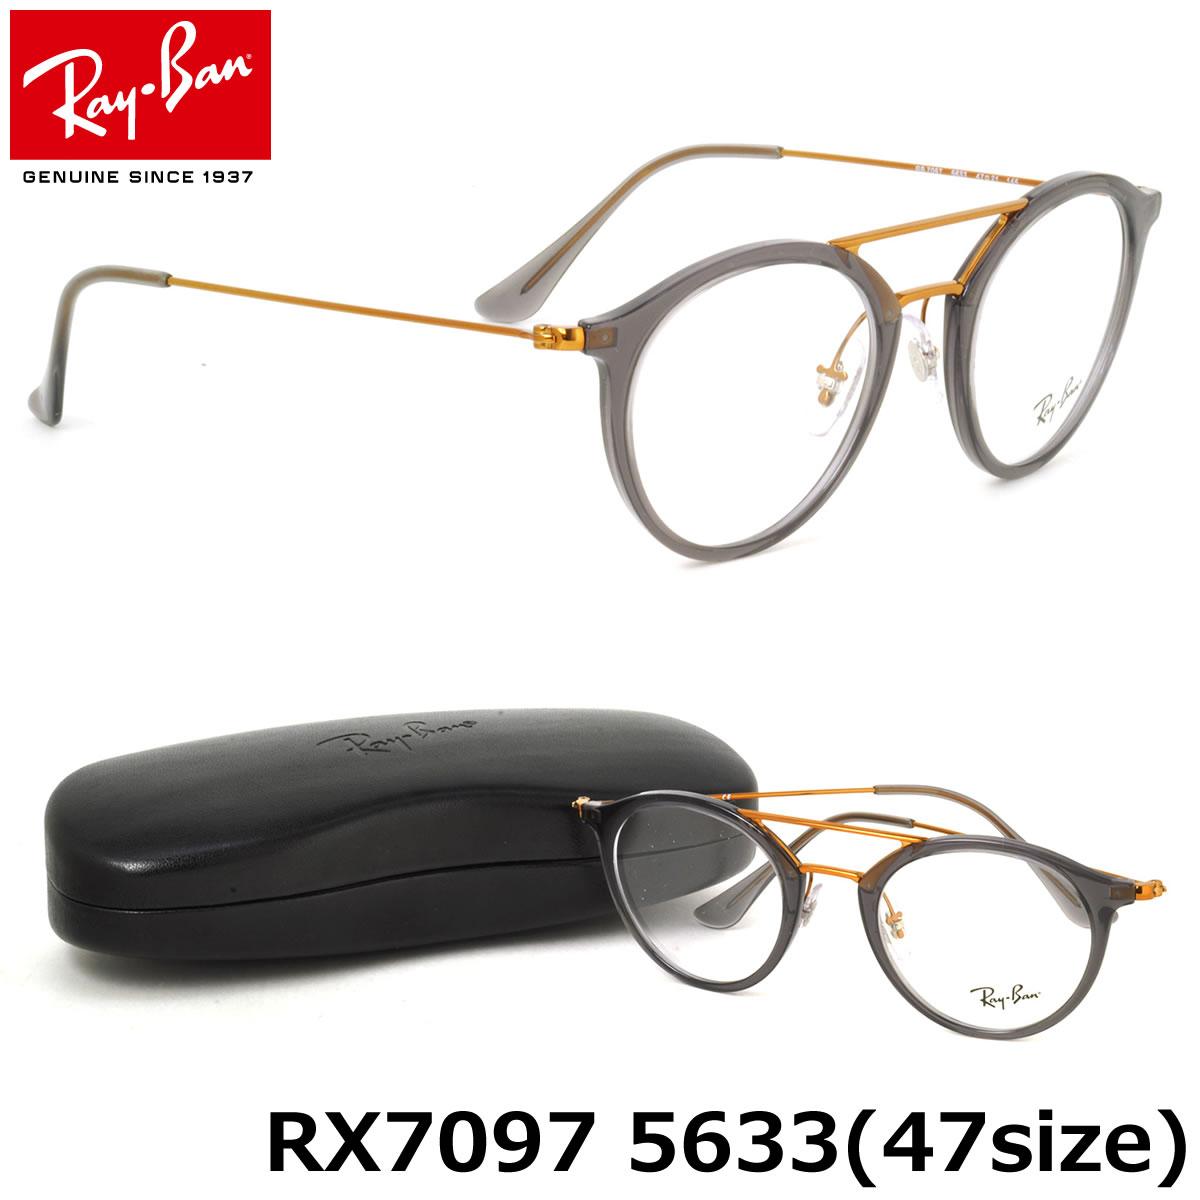 49b5e1c117 (Ray-Ban) glasses RX7097 5633 47 size-to-bridge round round glasses RayBan  men s women s